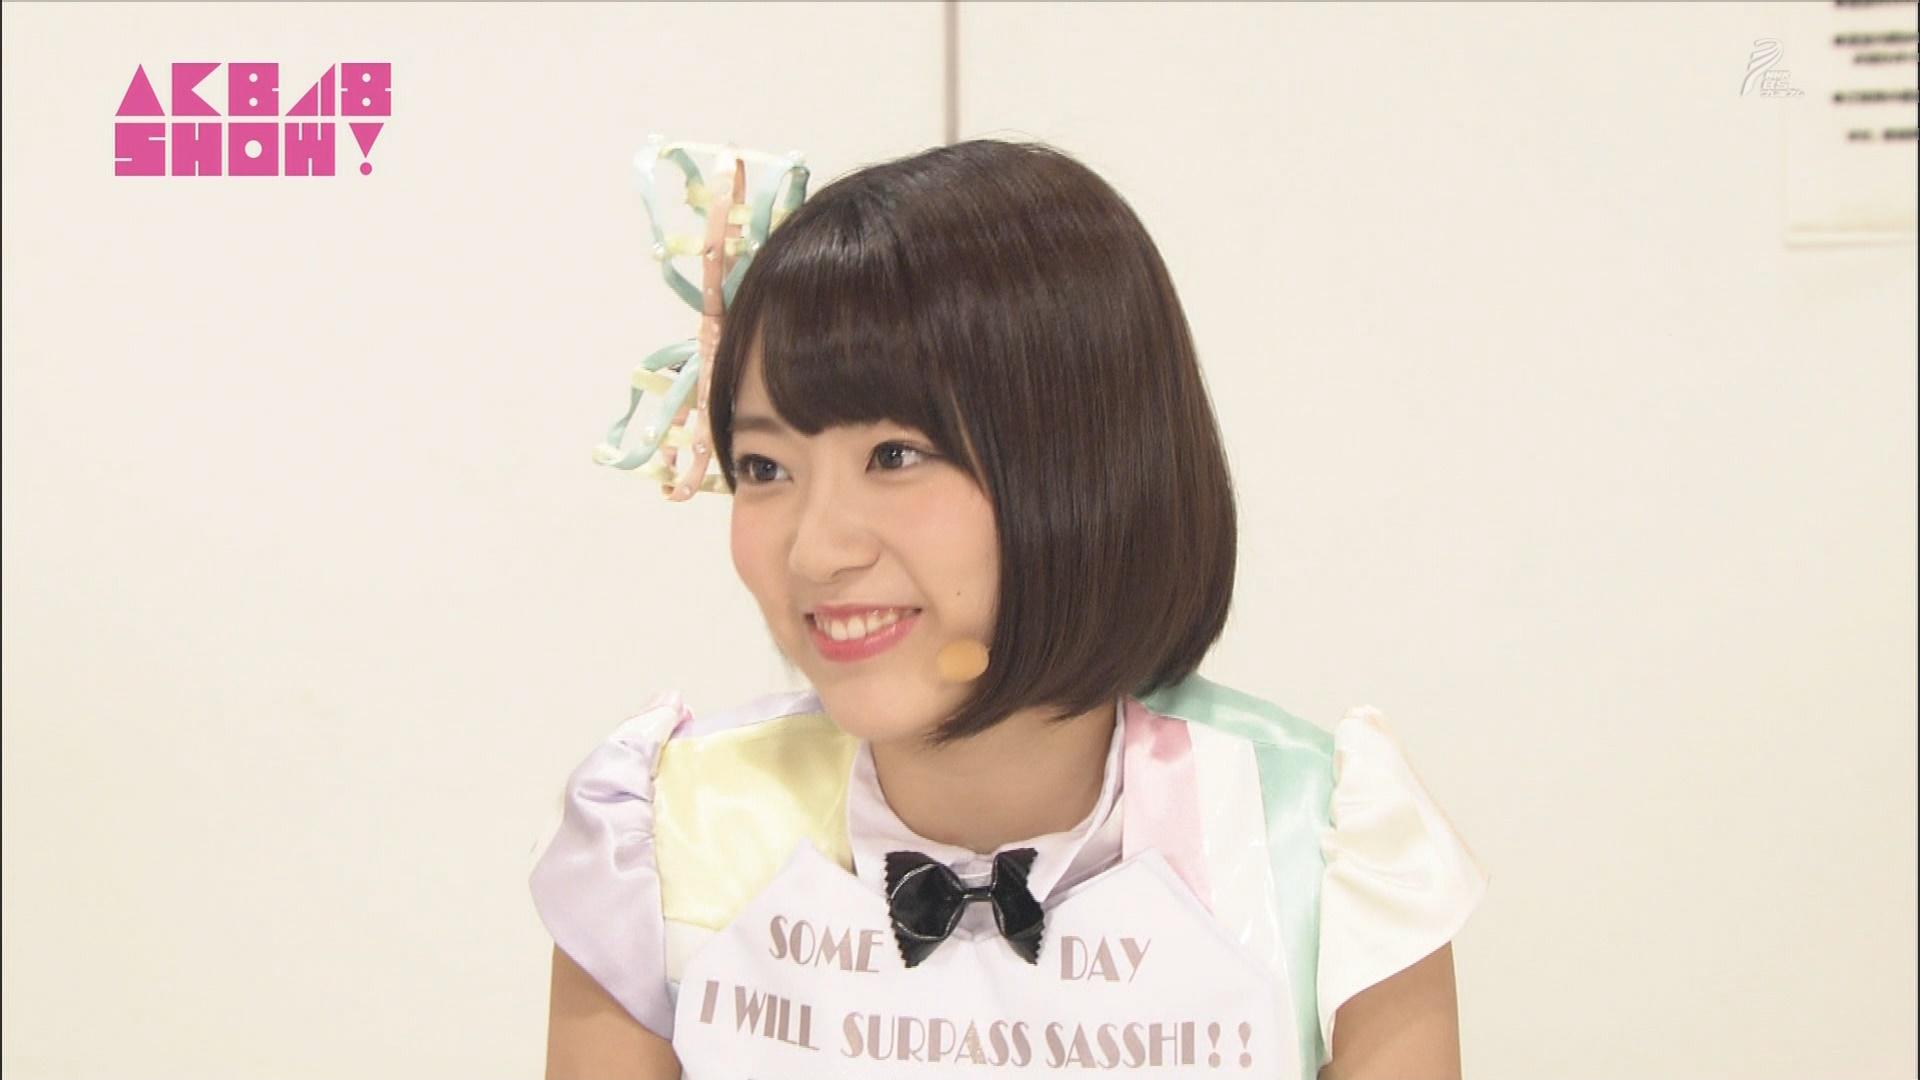 AKB48SHOW 心のプラカード 宮脇咲良 20140830 (10)